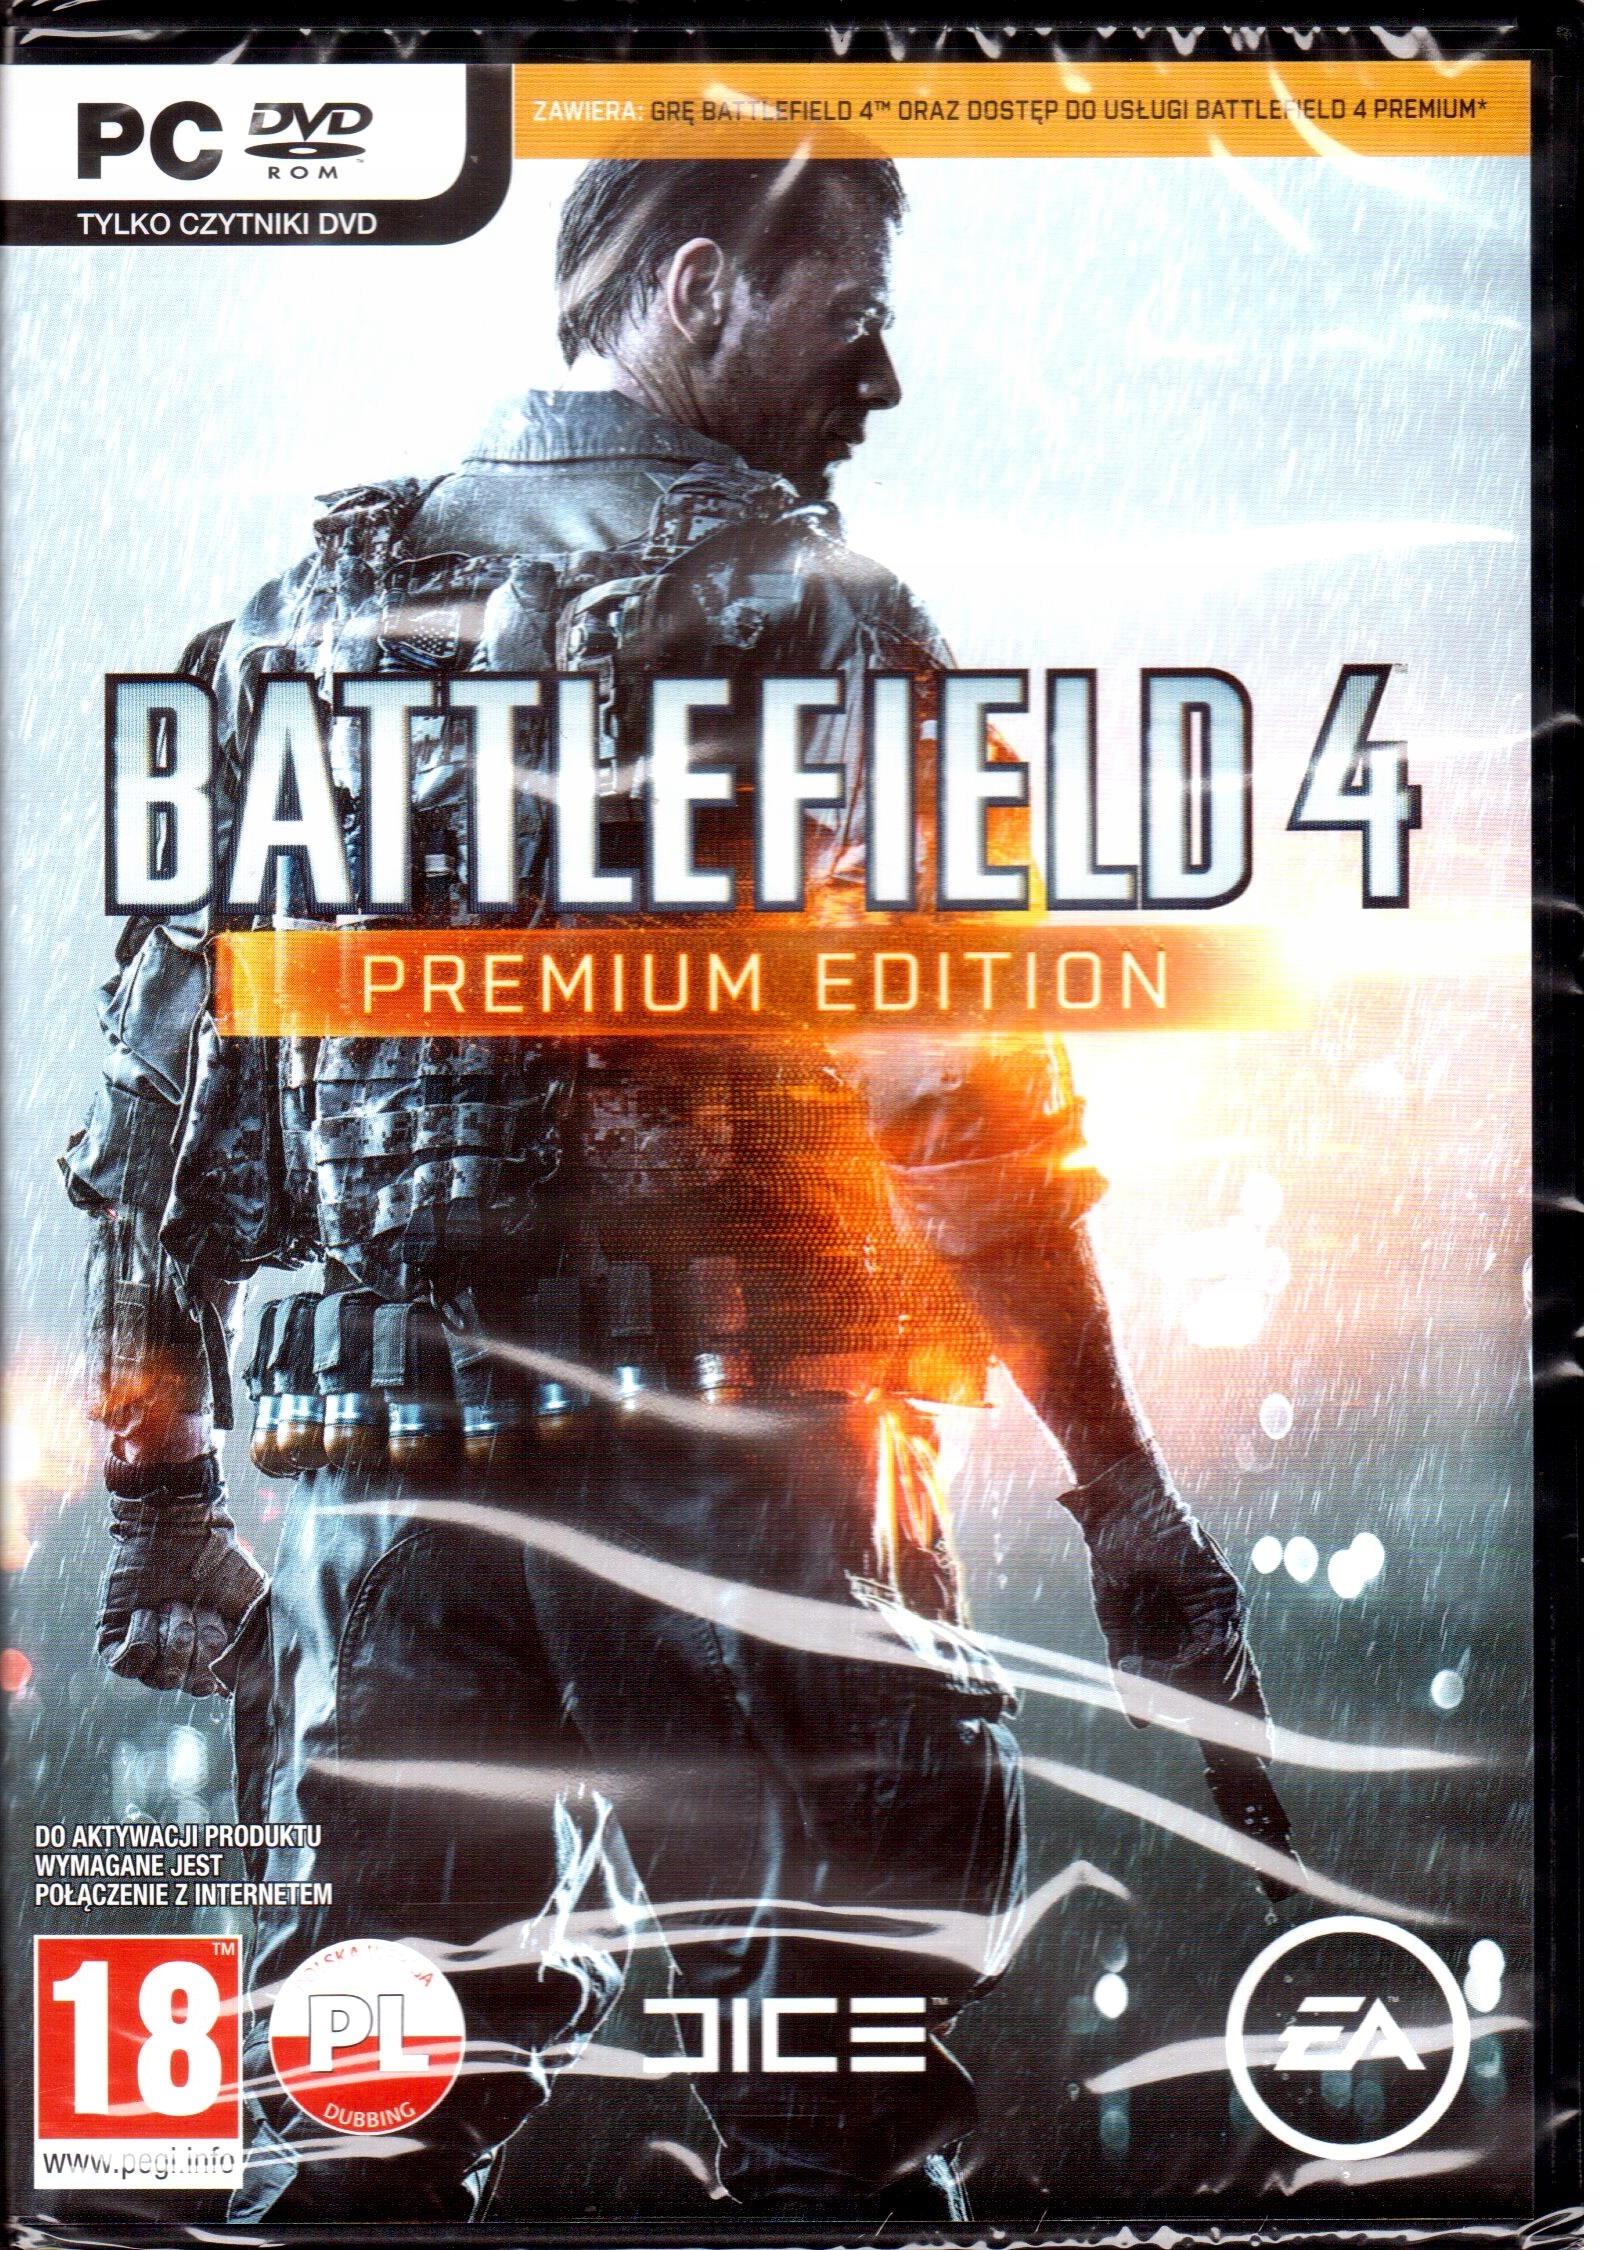 Battlefield 4 Premium Edition Pc Nowa W Folii Stan Nowy 7787963263 Allegro Pl